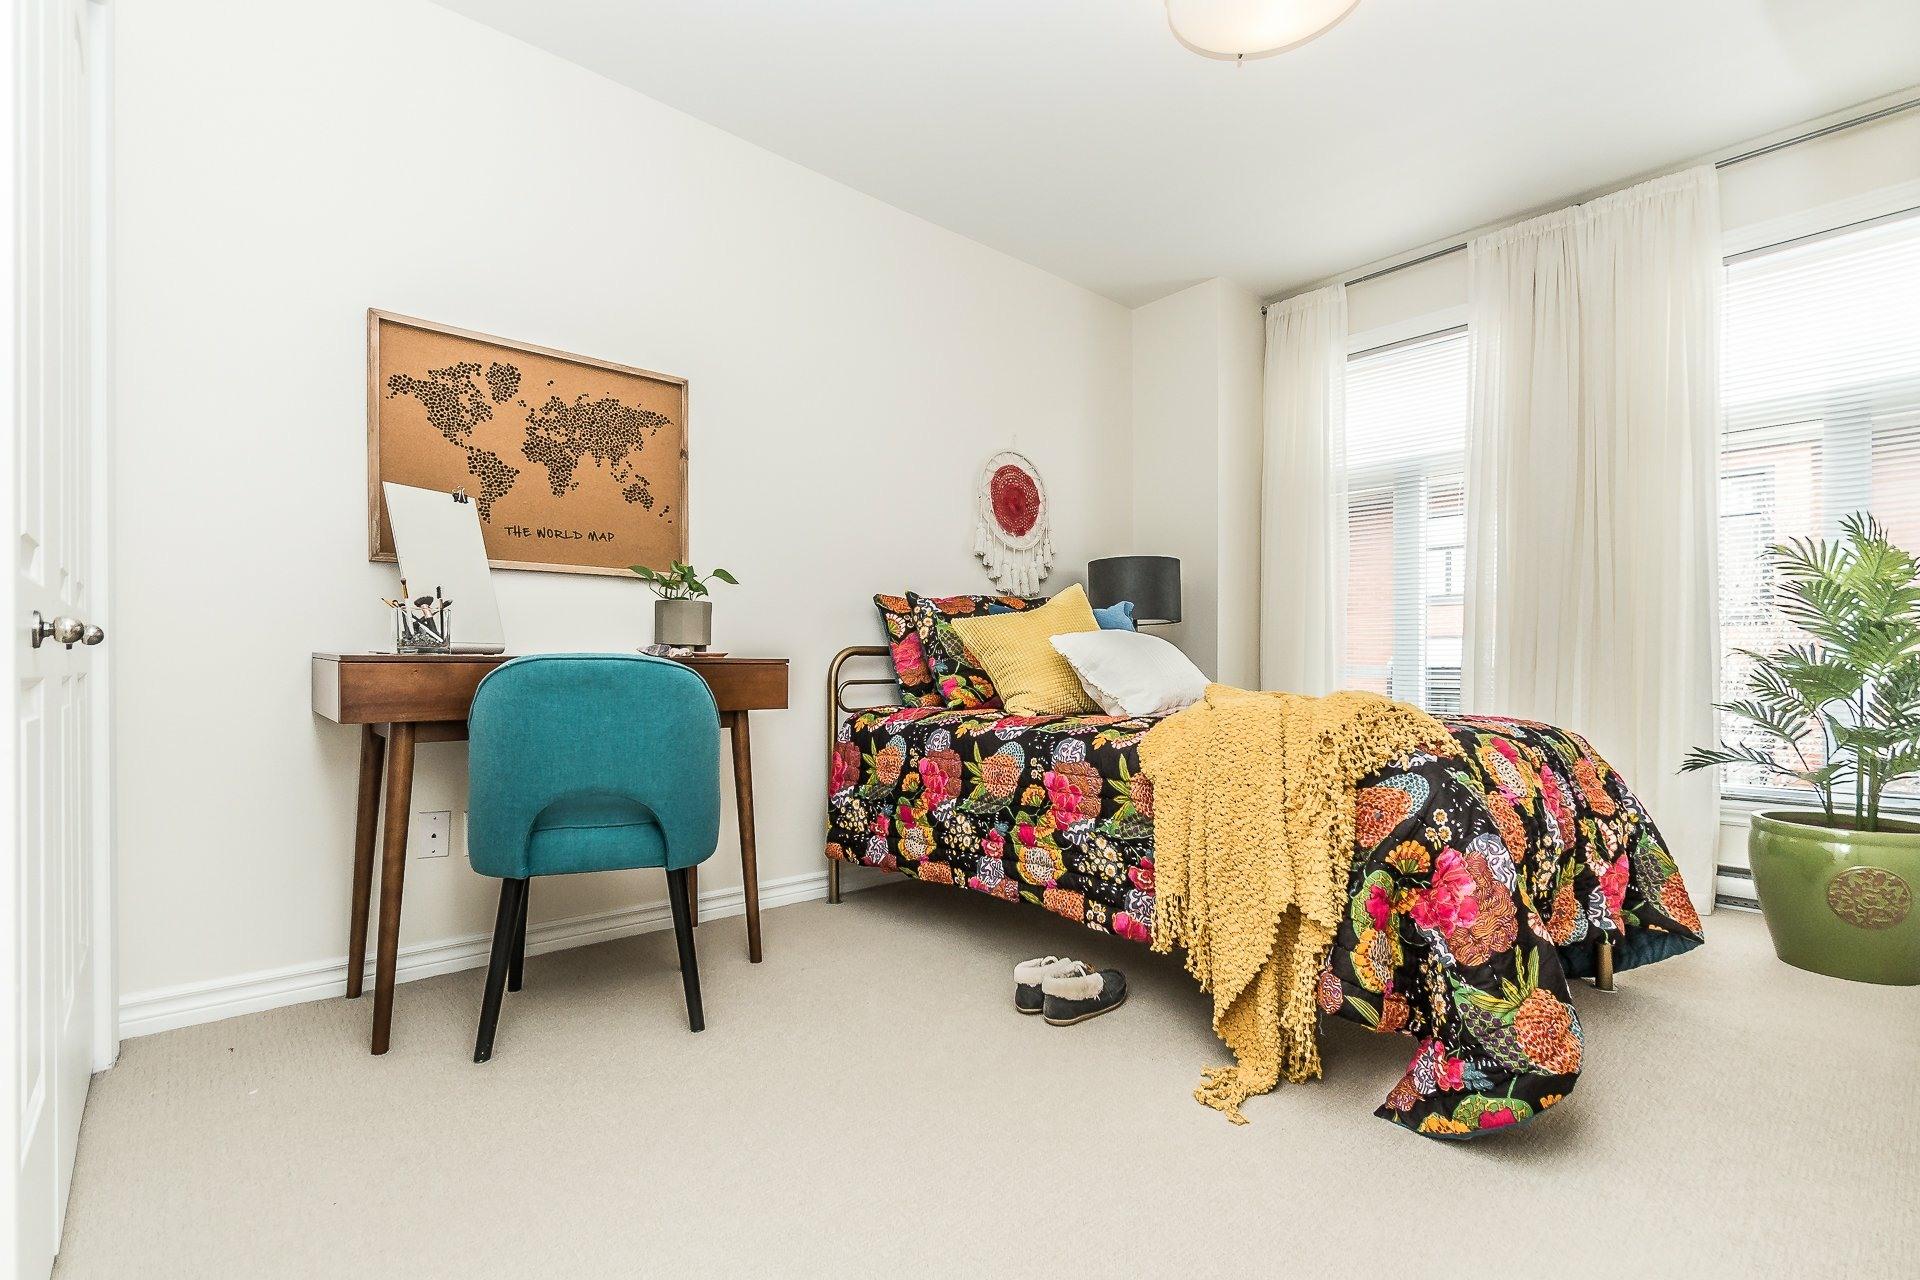 image 16 - MX - Casa sola - MX En venta Montréal Lachine  - 8 habitaciones